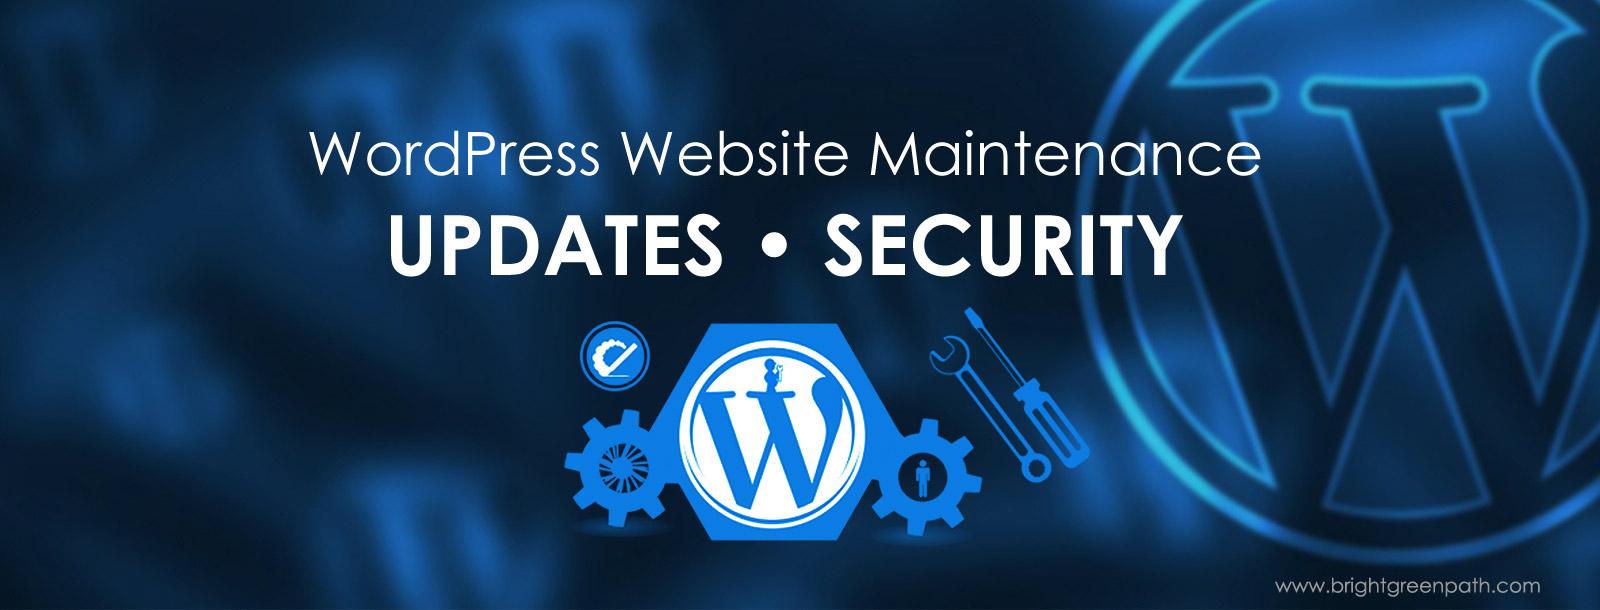 Florida WordPress Website Maintenance Services